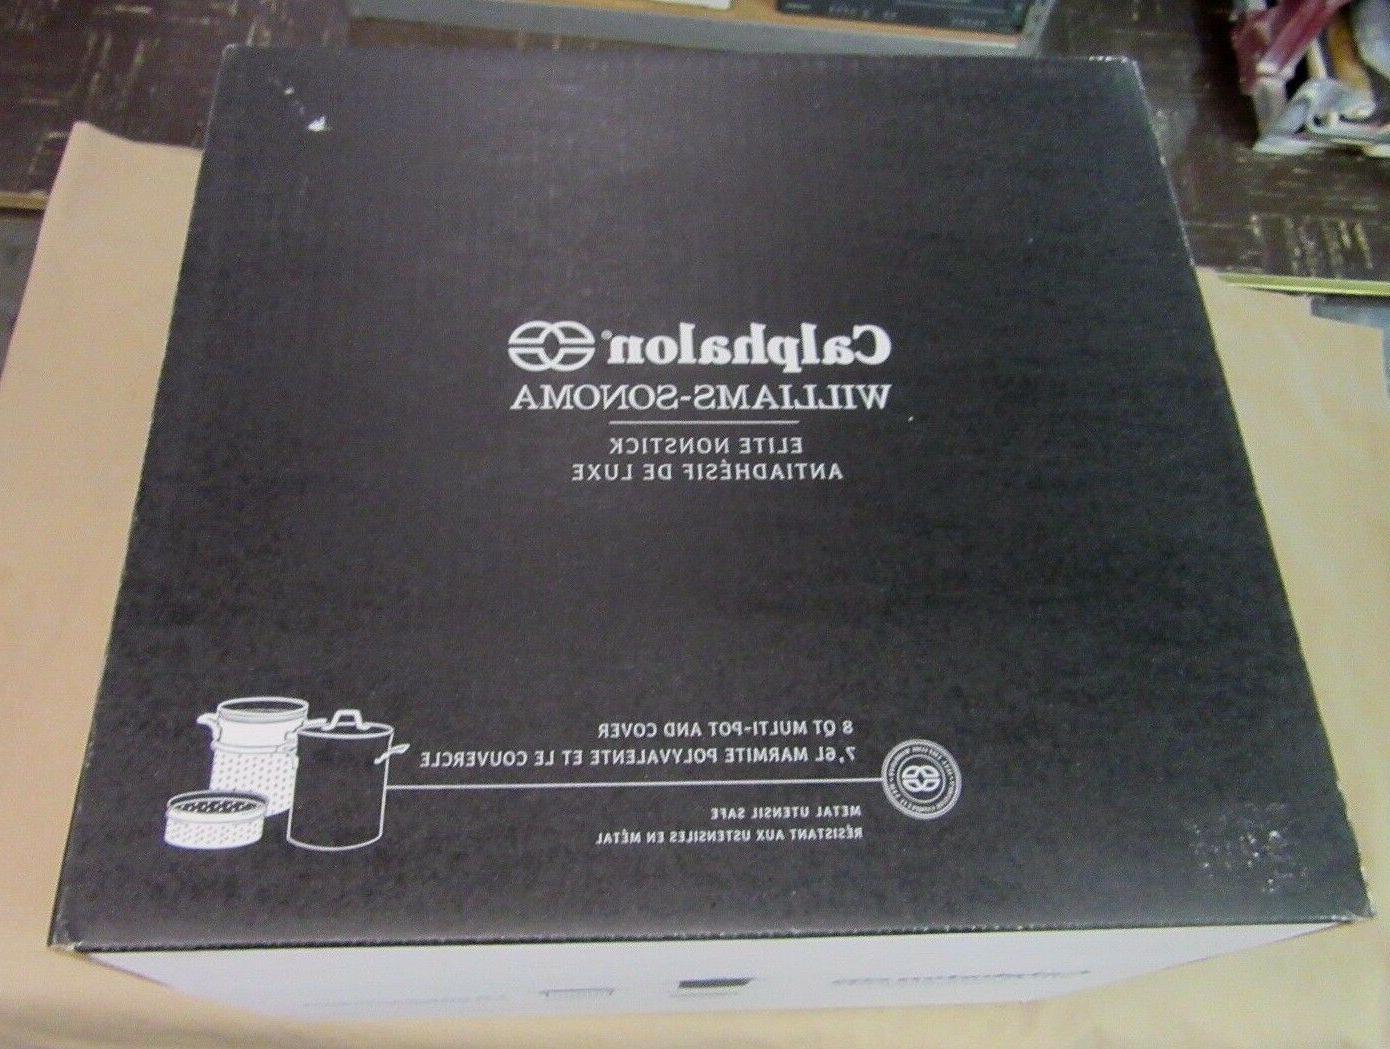 New Calphalon Williams Sonoma Elite NonStick 8 QT Multi-Pot